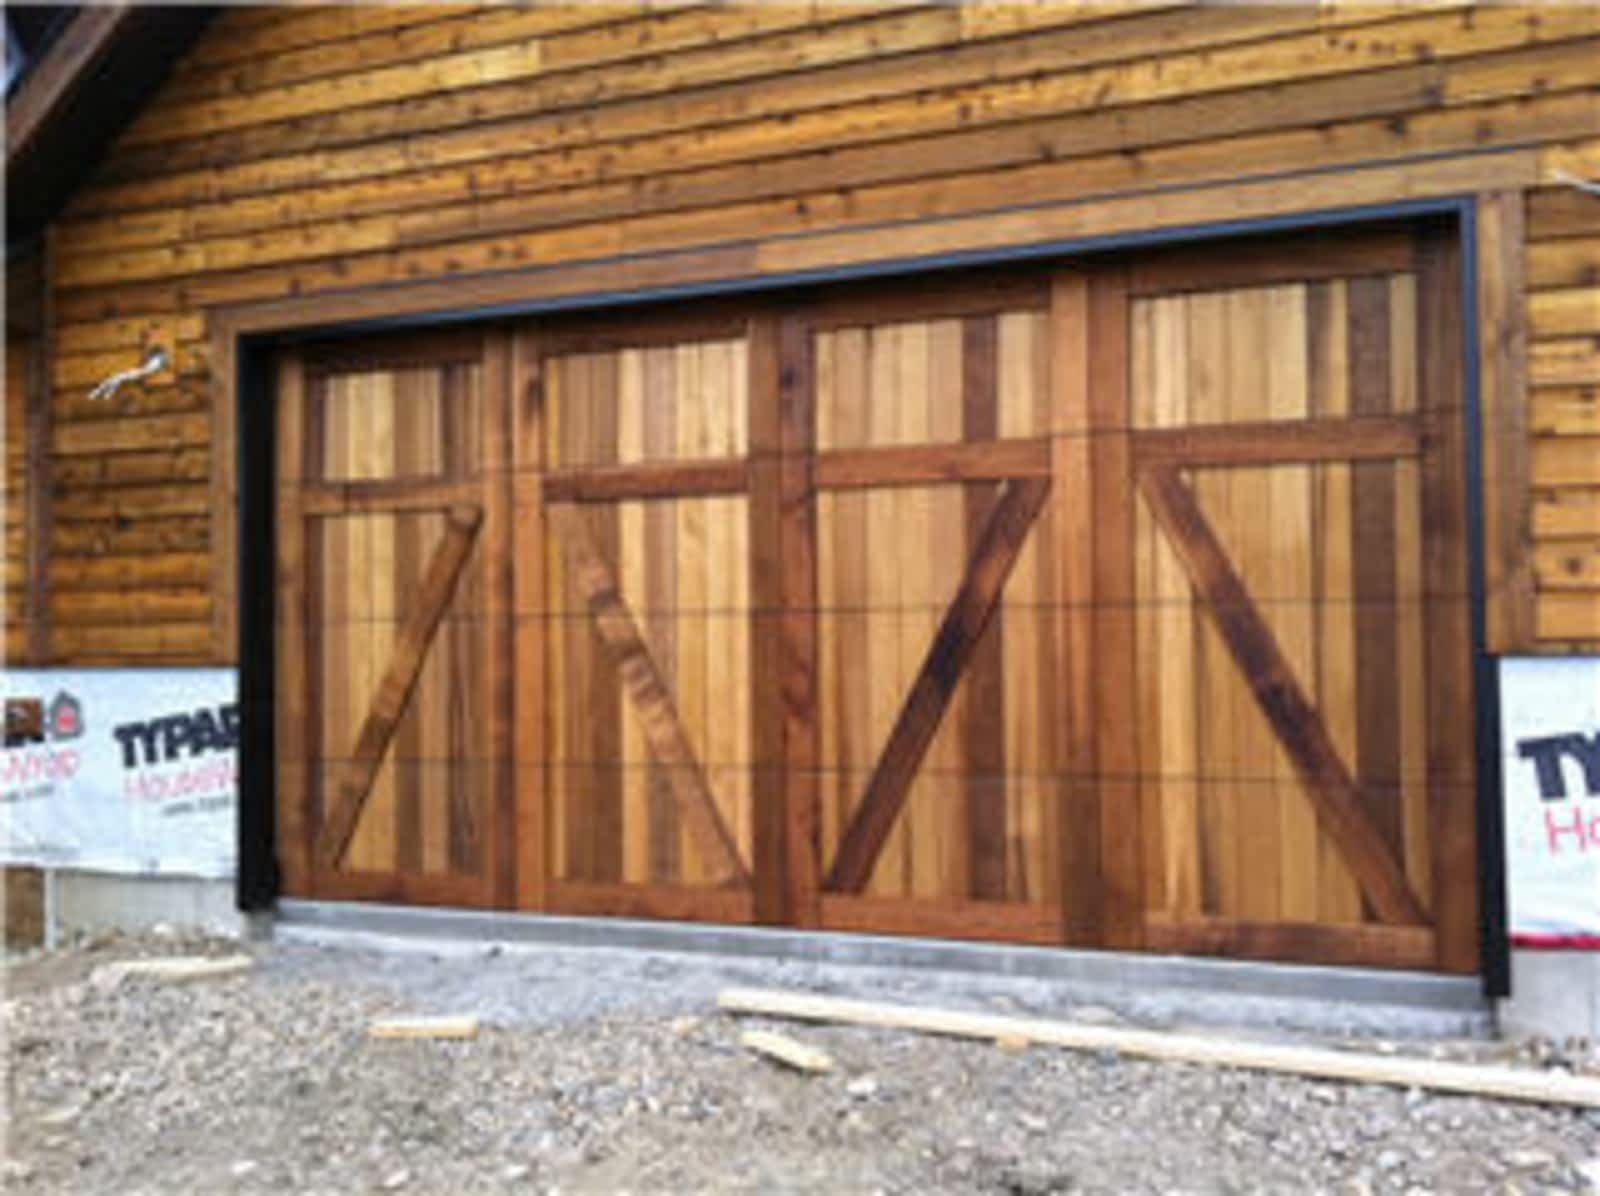 Garage door doctor opening hours po box 1360 raymond ab rubansaba